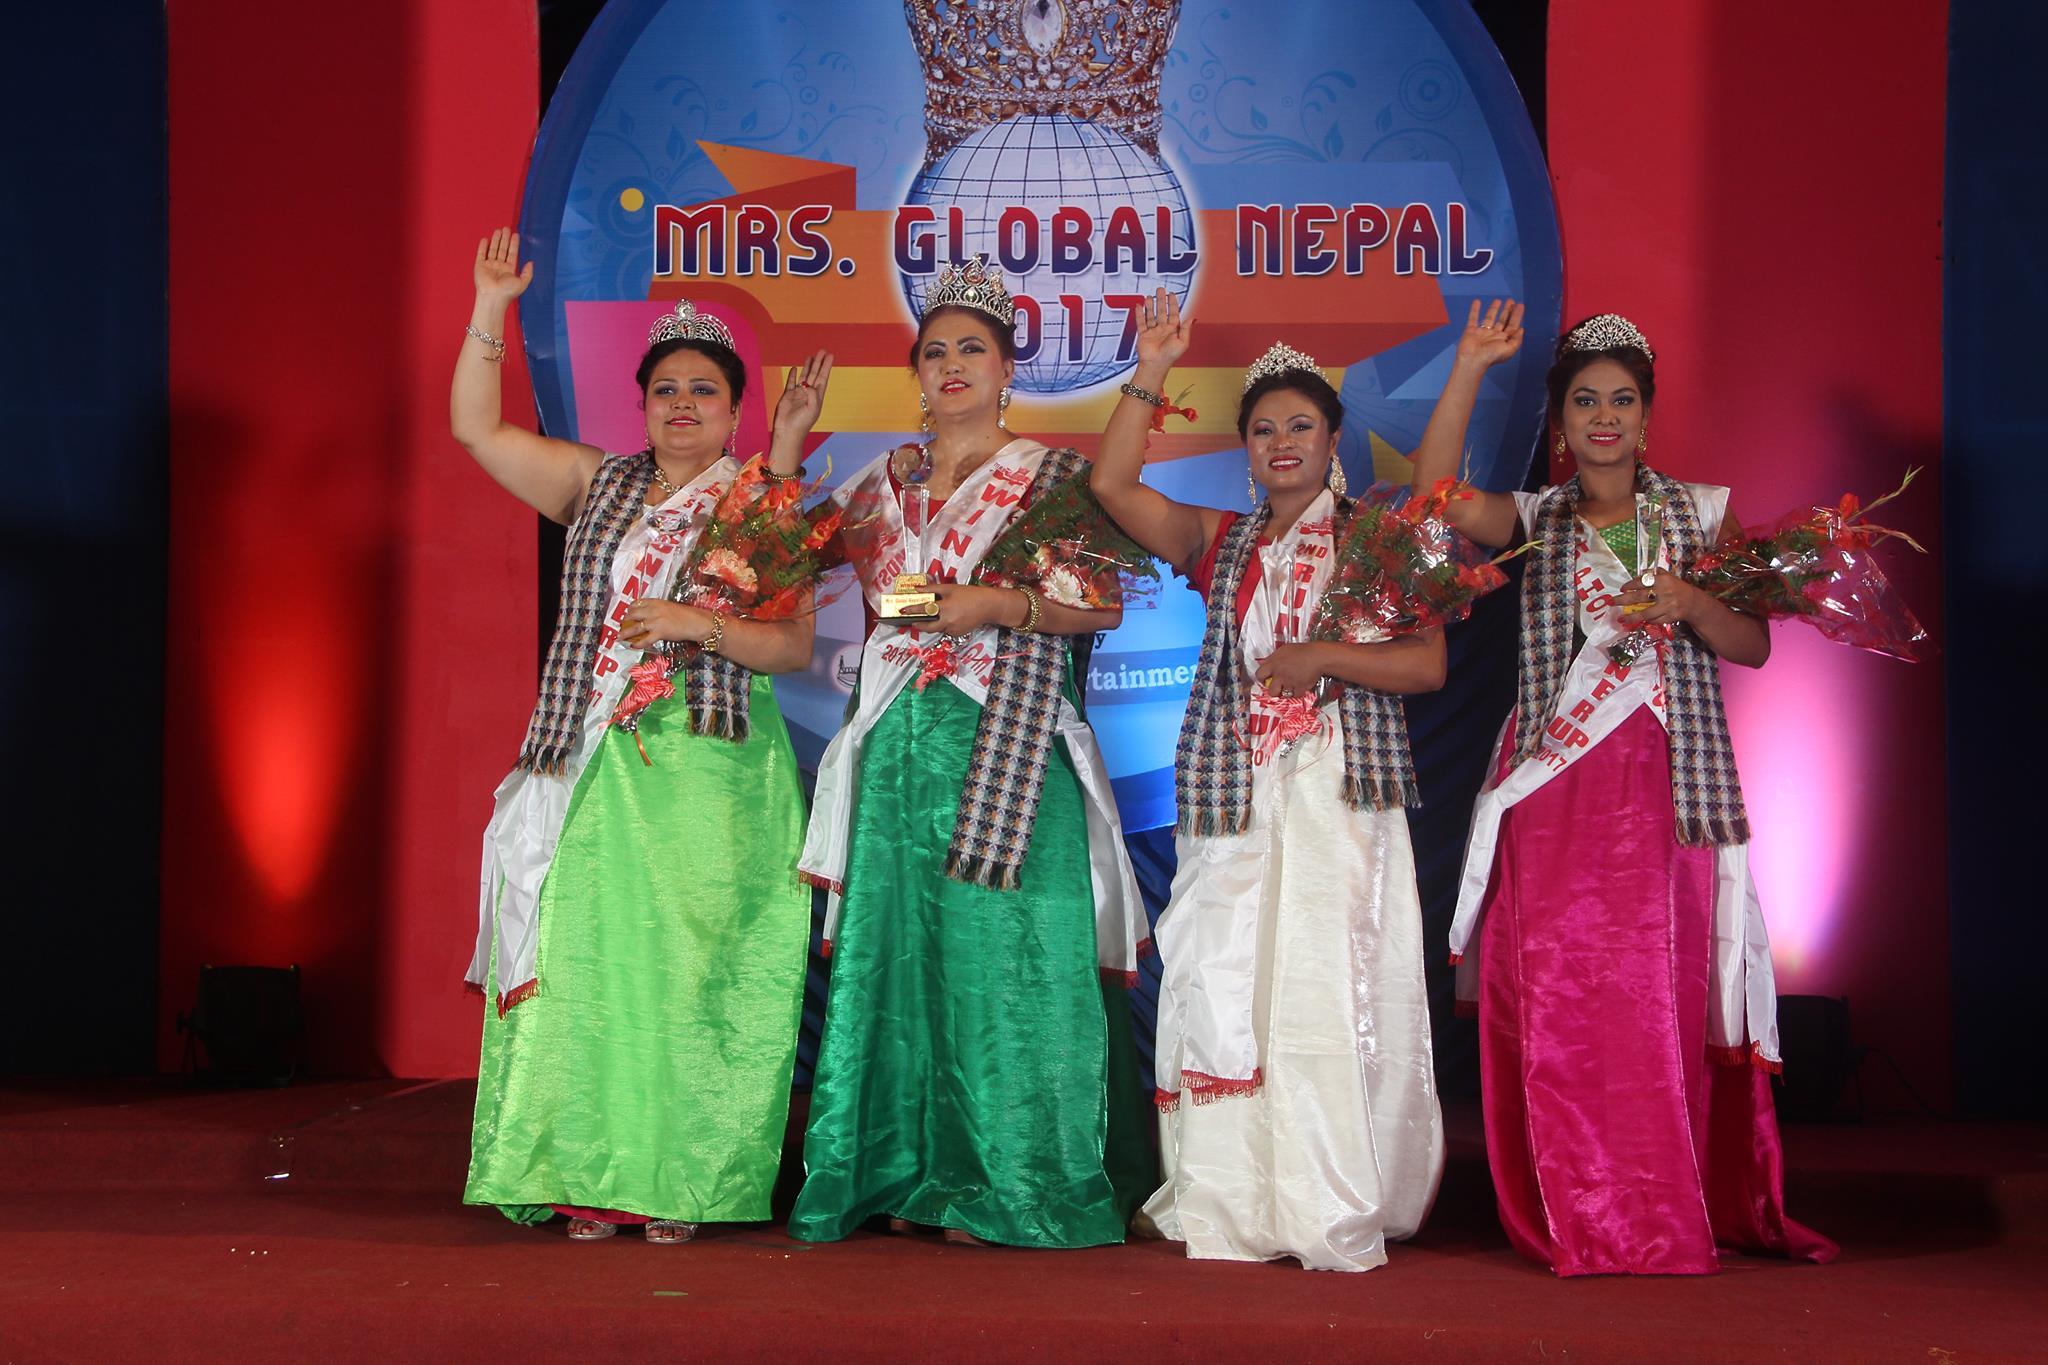 mrs global nepal 2017 final 4